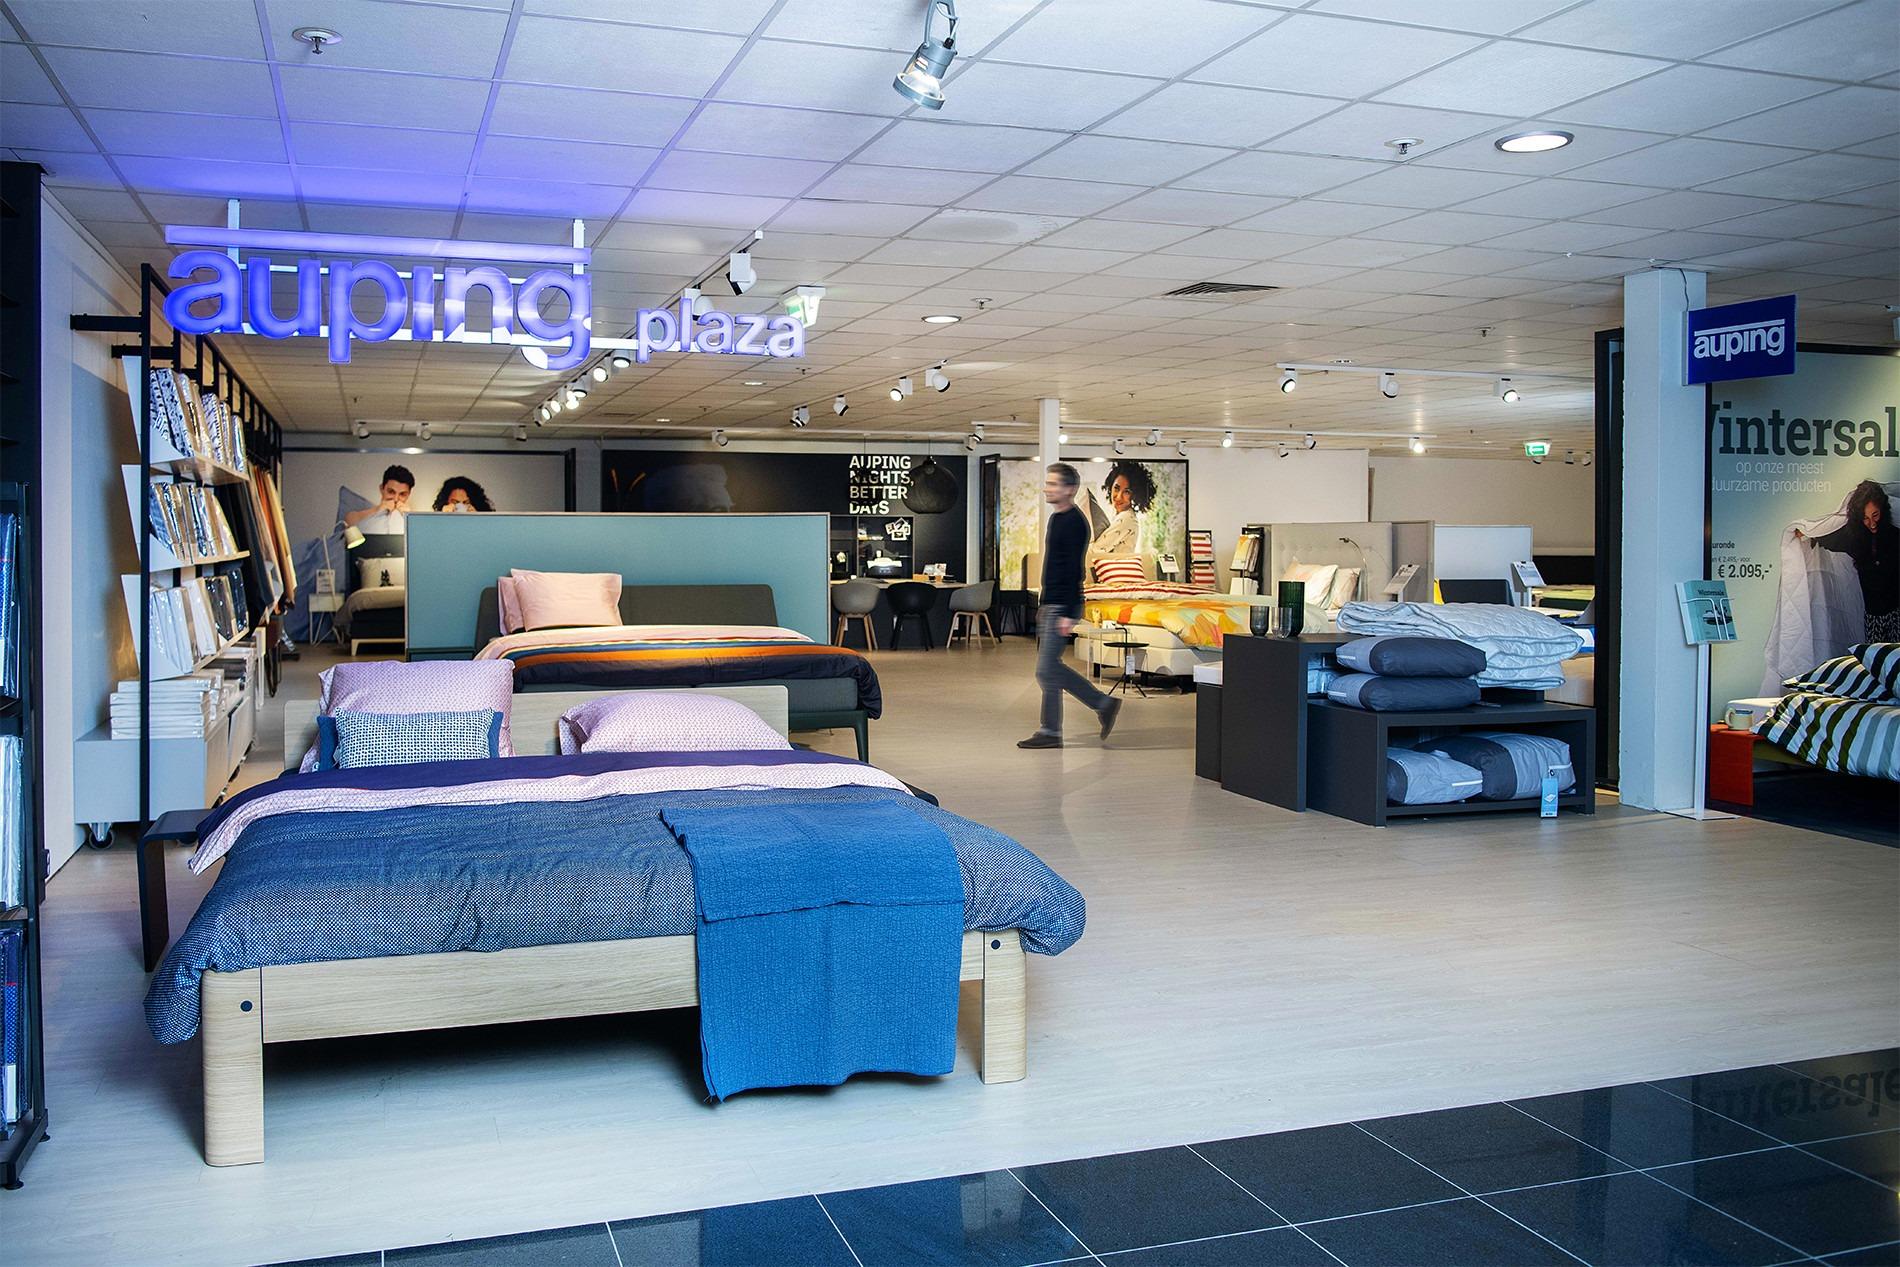 Auping beddenwinkel Groningen